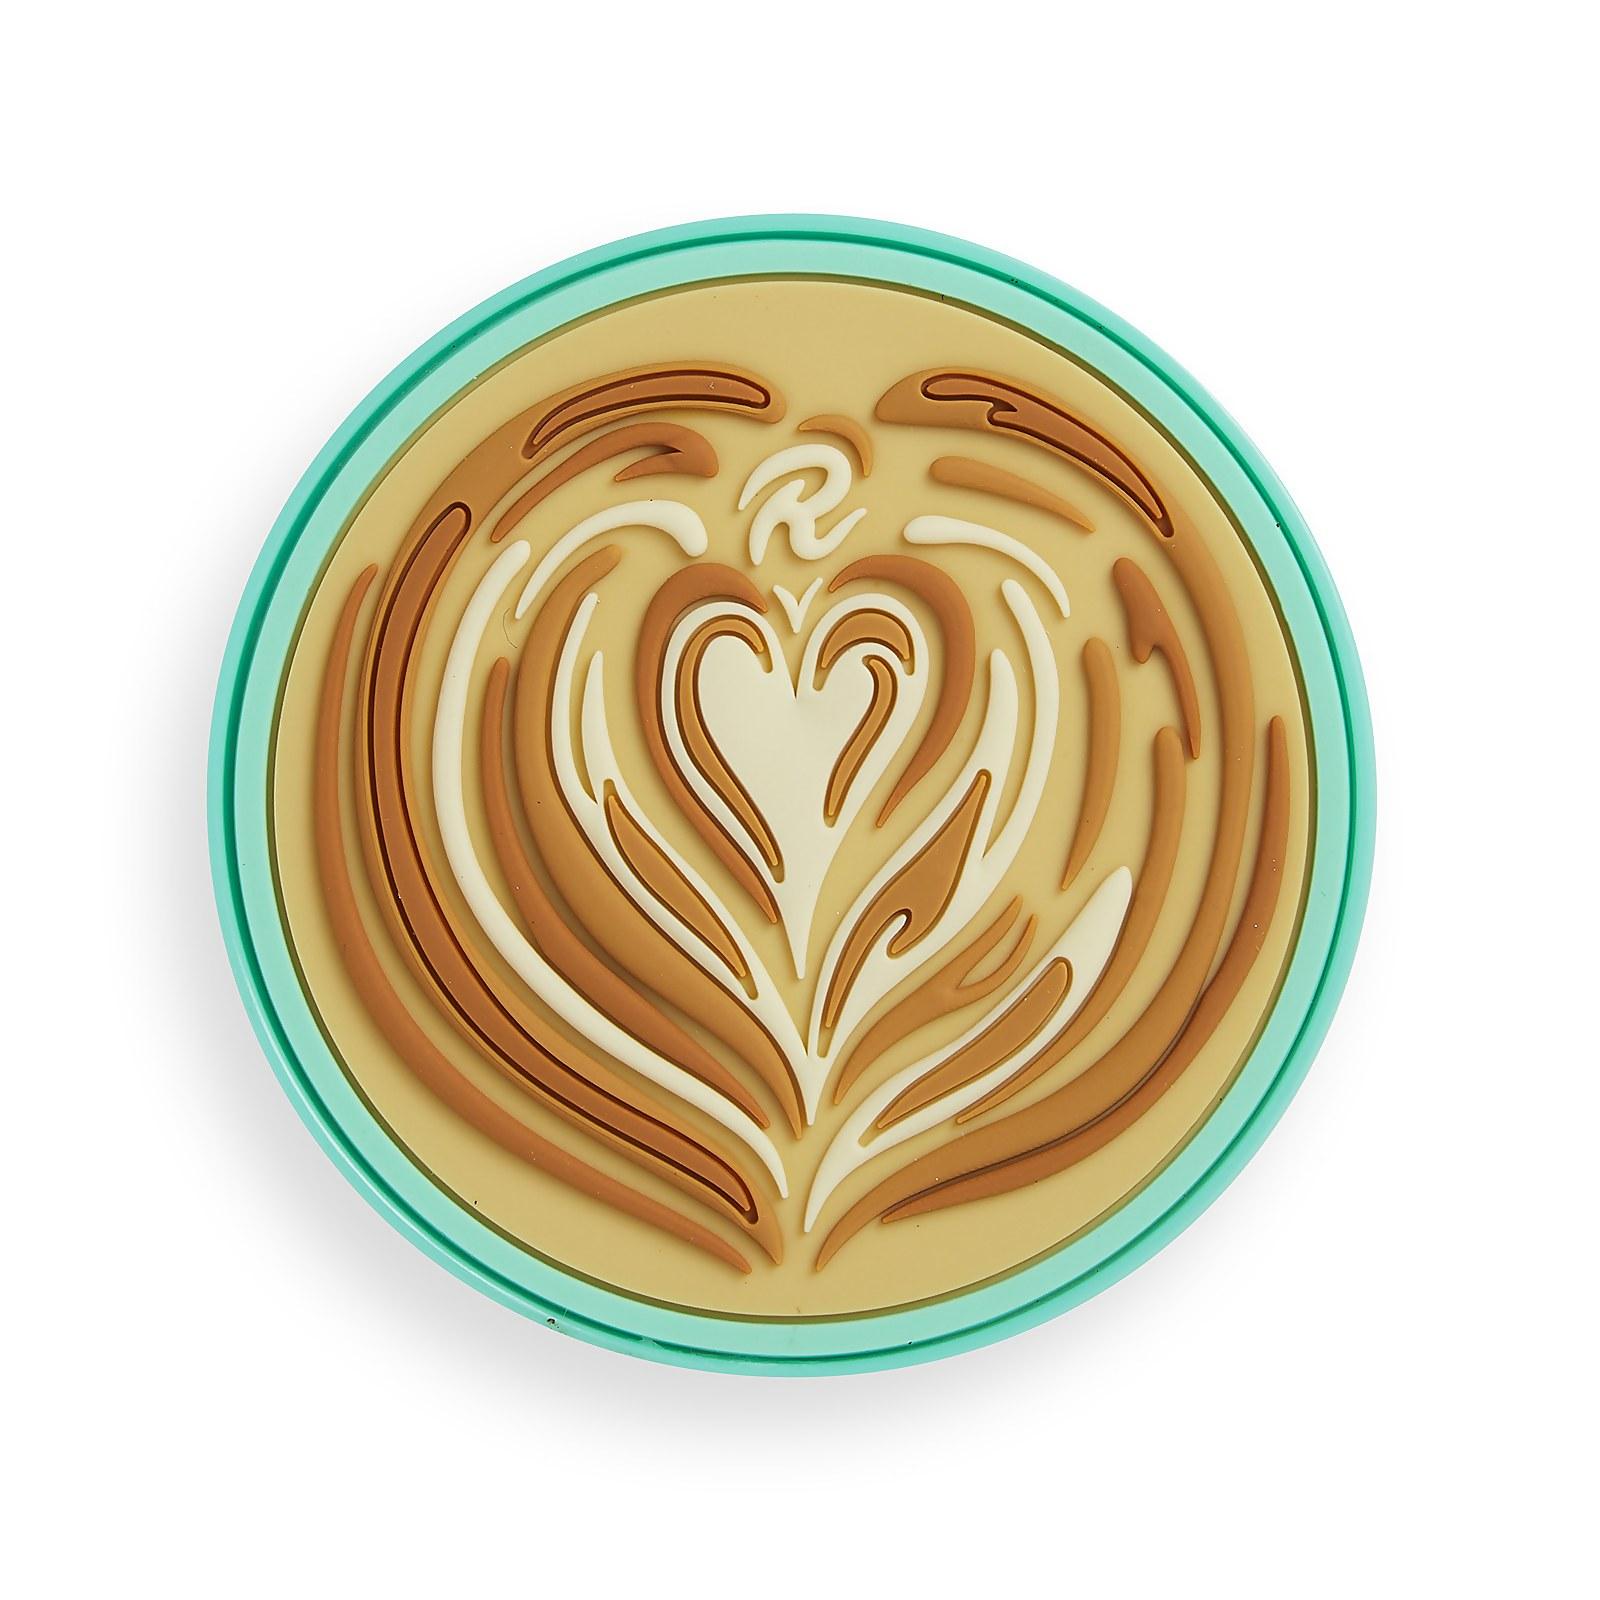 Купить Revolution I Heart Revolution Tasty Coffee Bronzer - Cappuccino